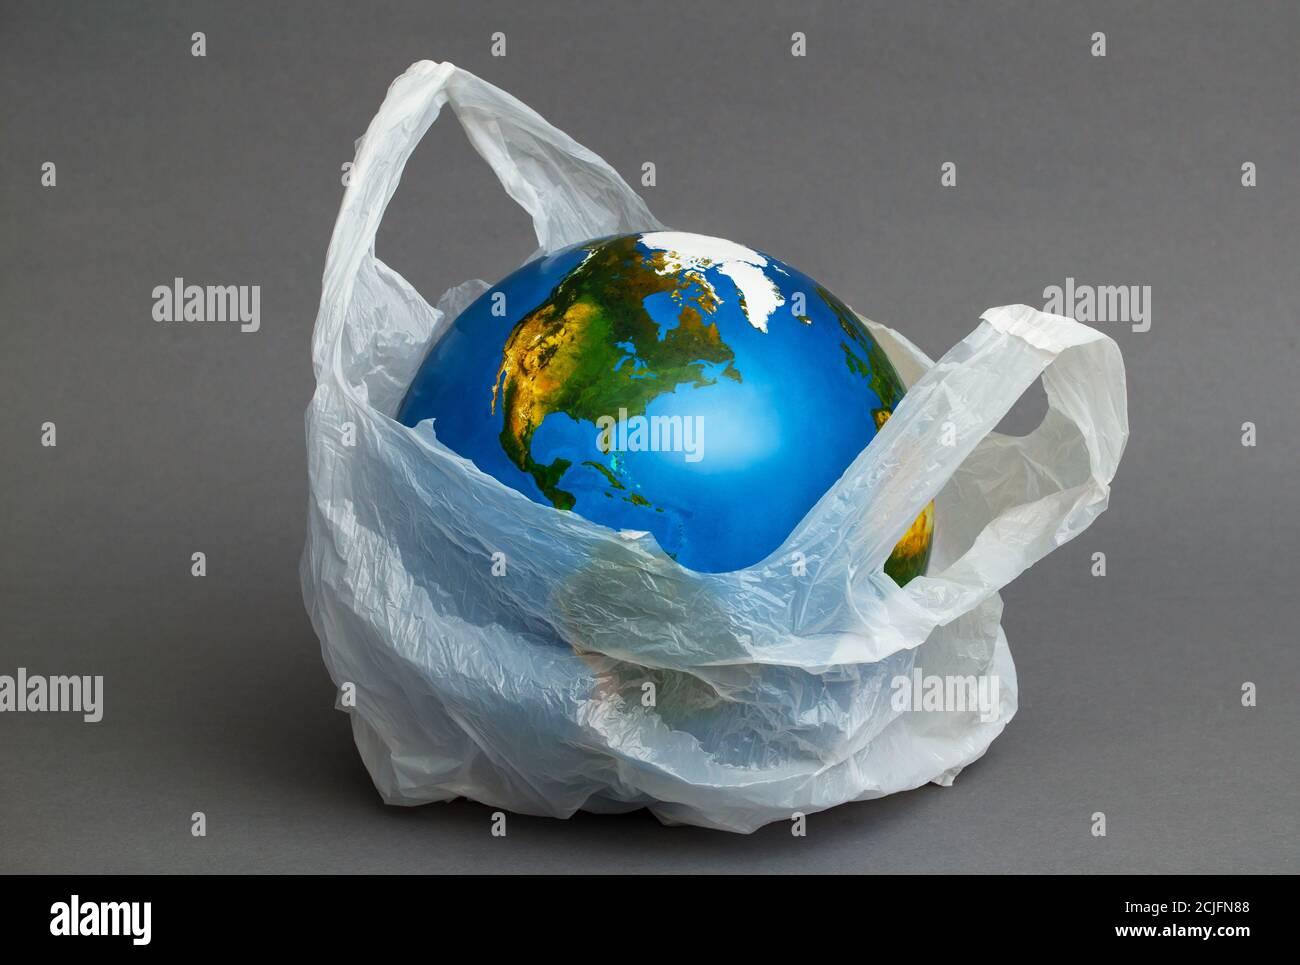 Globale Umweltverschmutzung durch Kunststoff. Recycling-Konzept Stockfoto